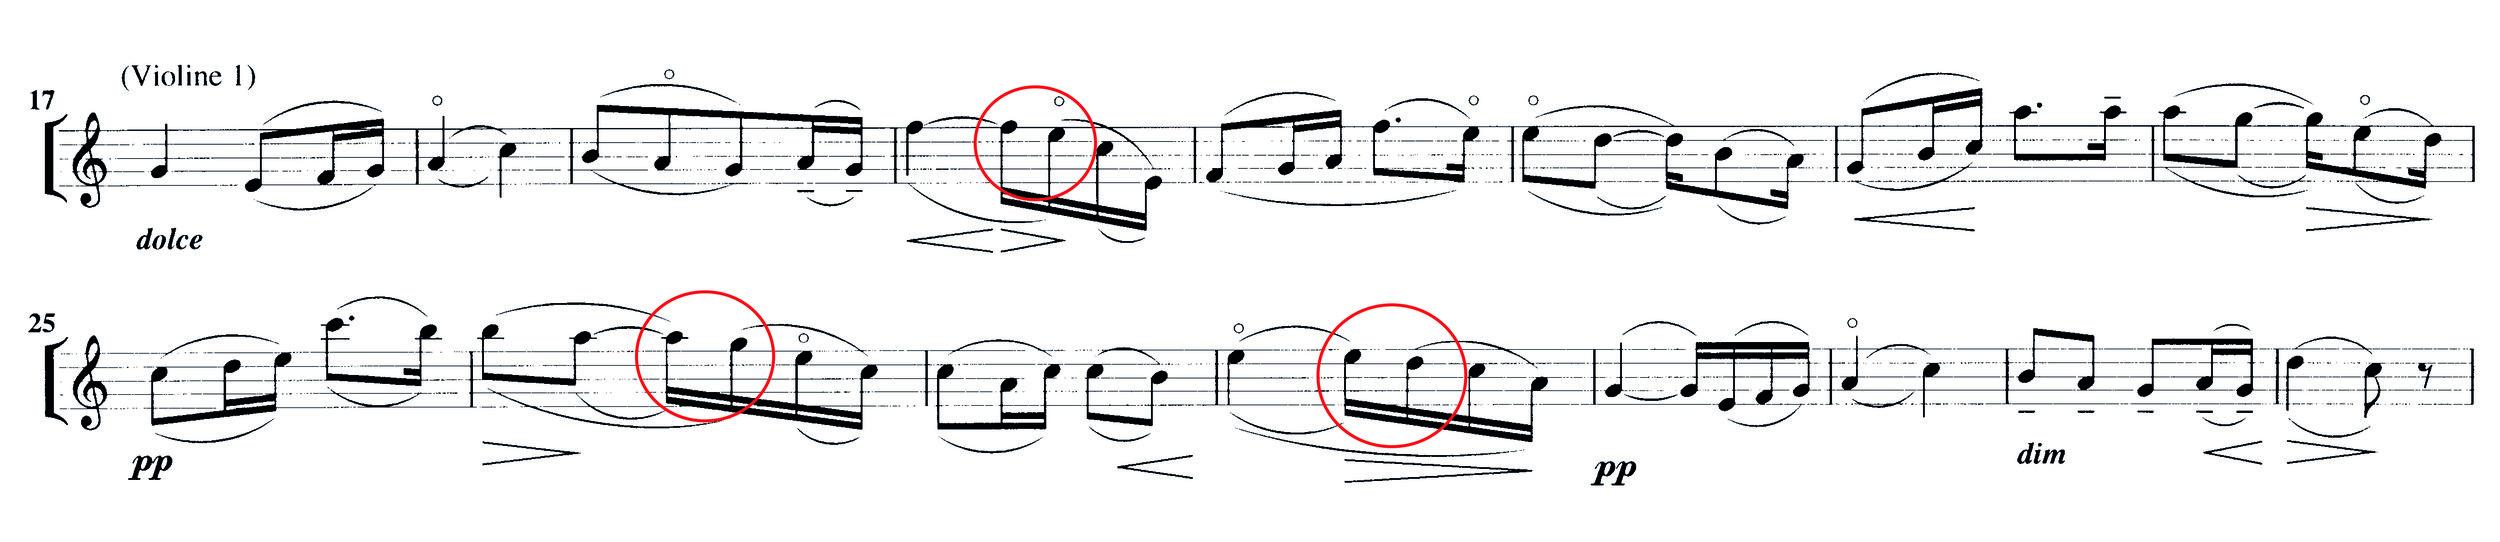 Abbildung 5: Elgar, Serenade op. 20, 2. Satz, T. 17-32. Oberhalb des Systemes: Norringtons Bogeneinteilung, unten das Original.